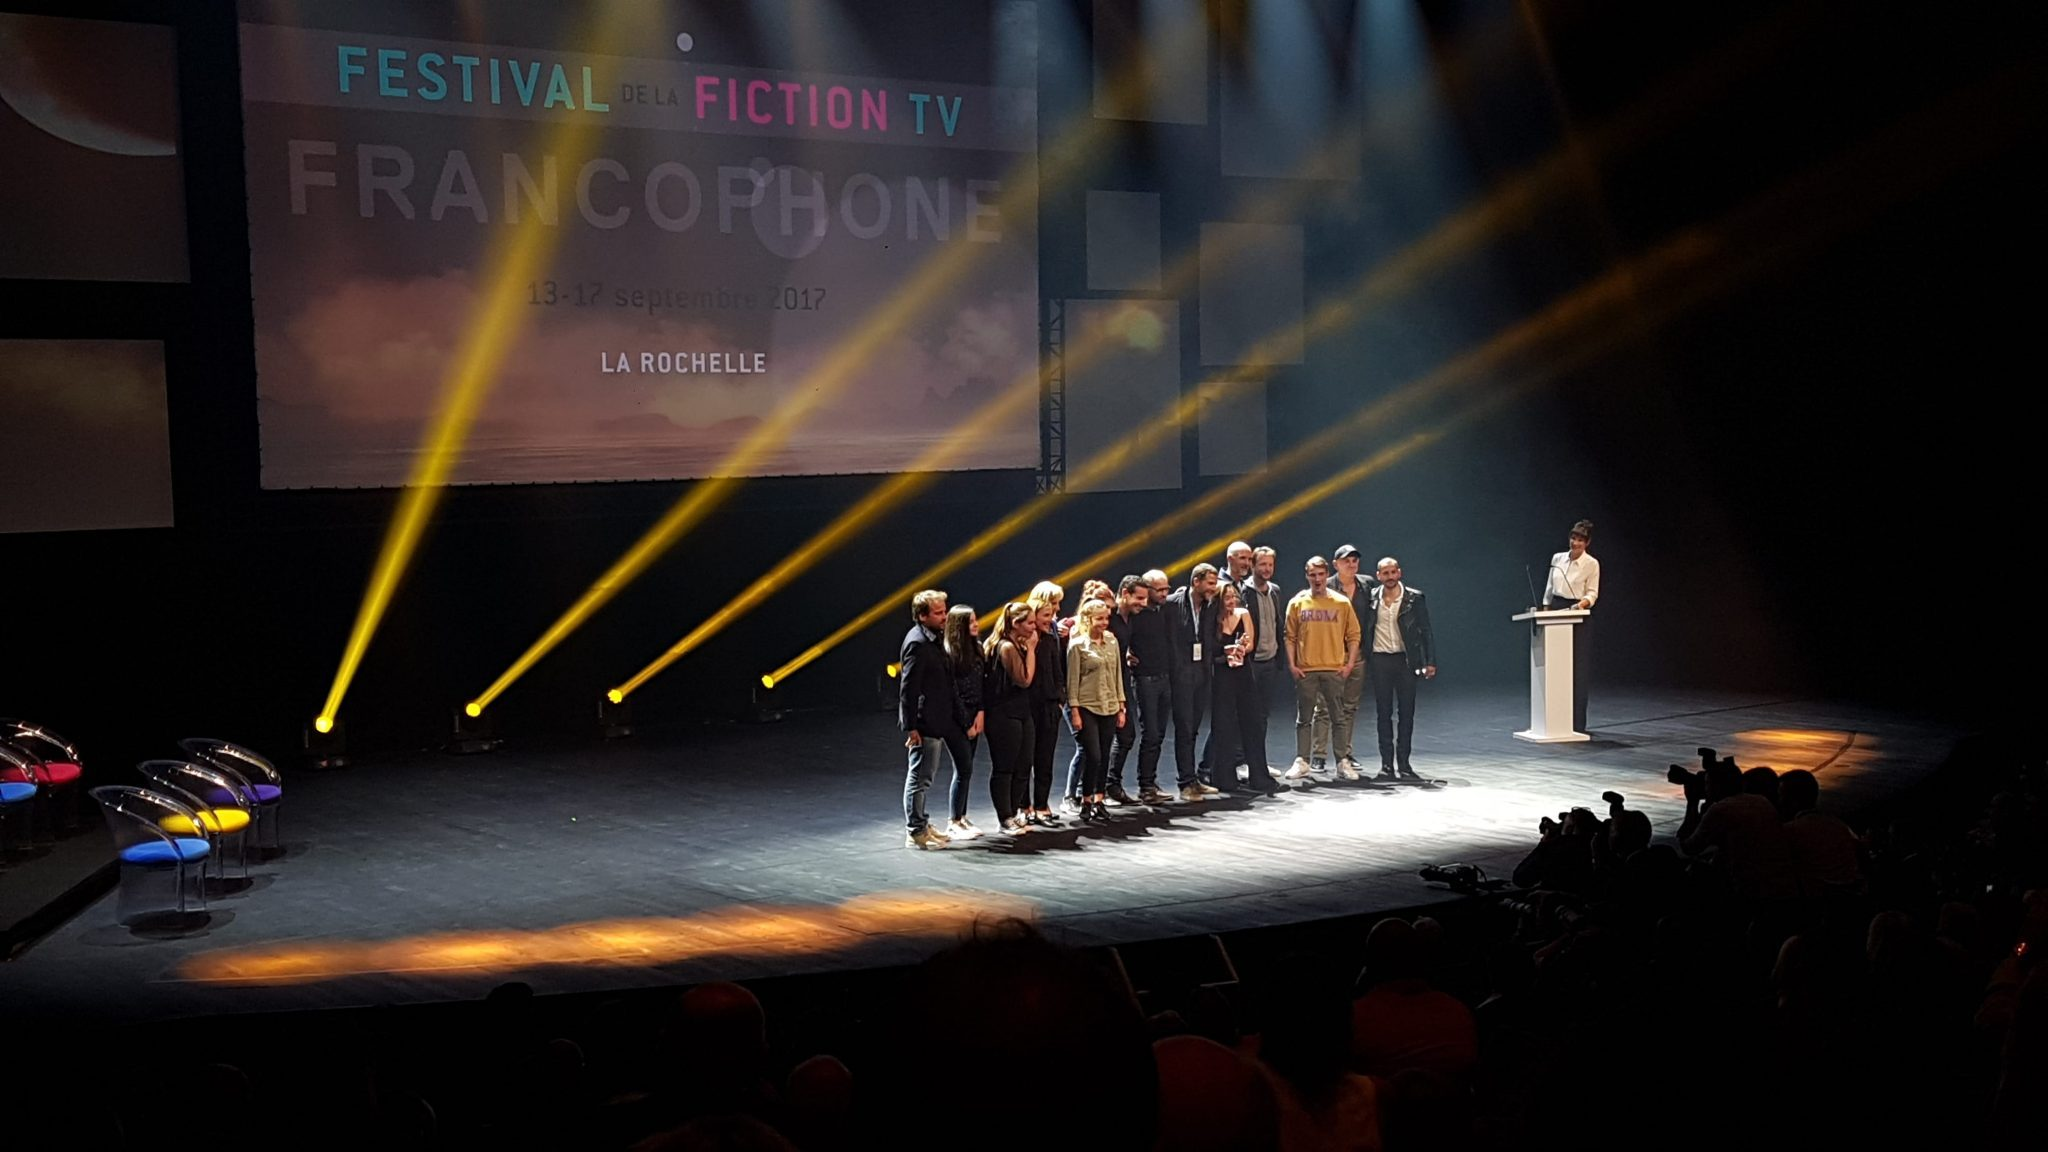 festival de la fiction tv de la rochelle 2017 image Hollyweed